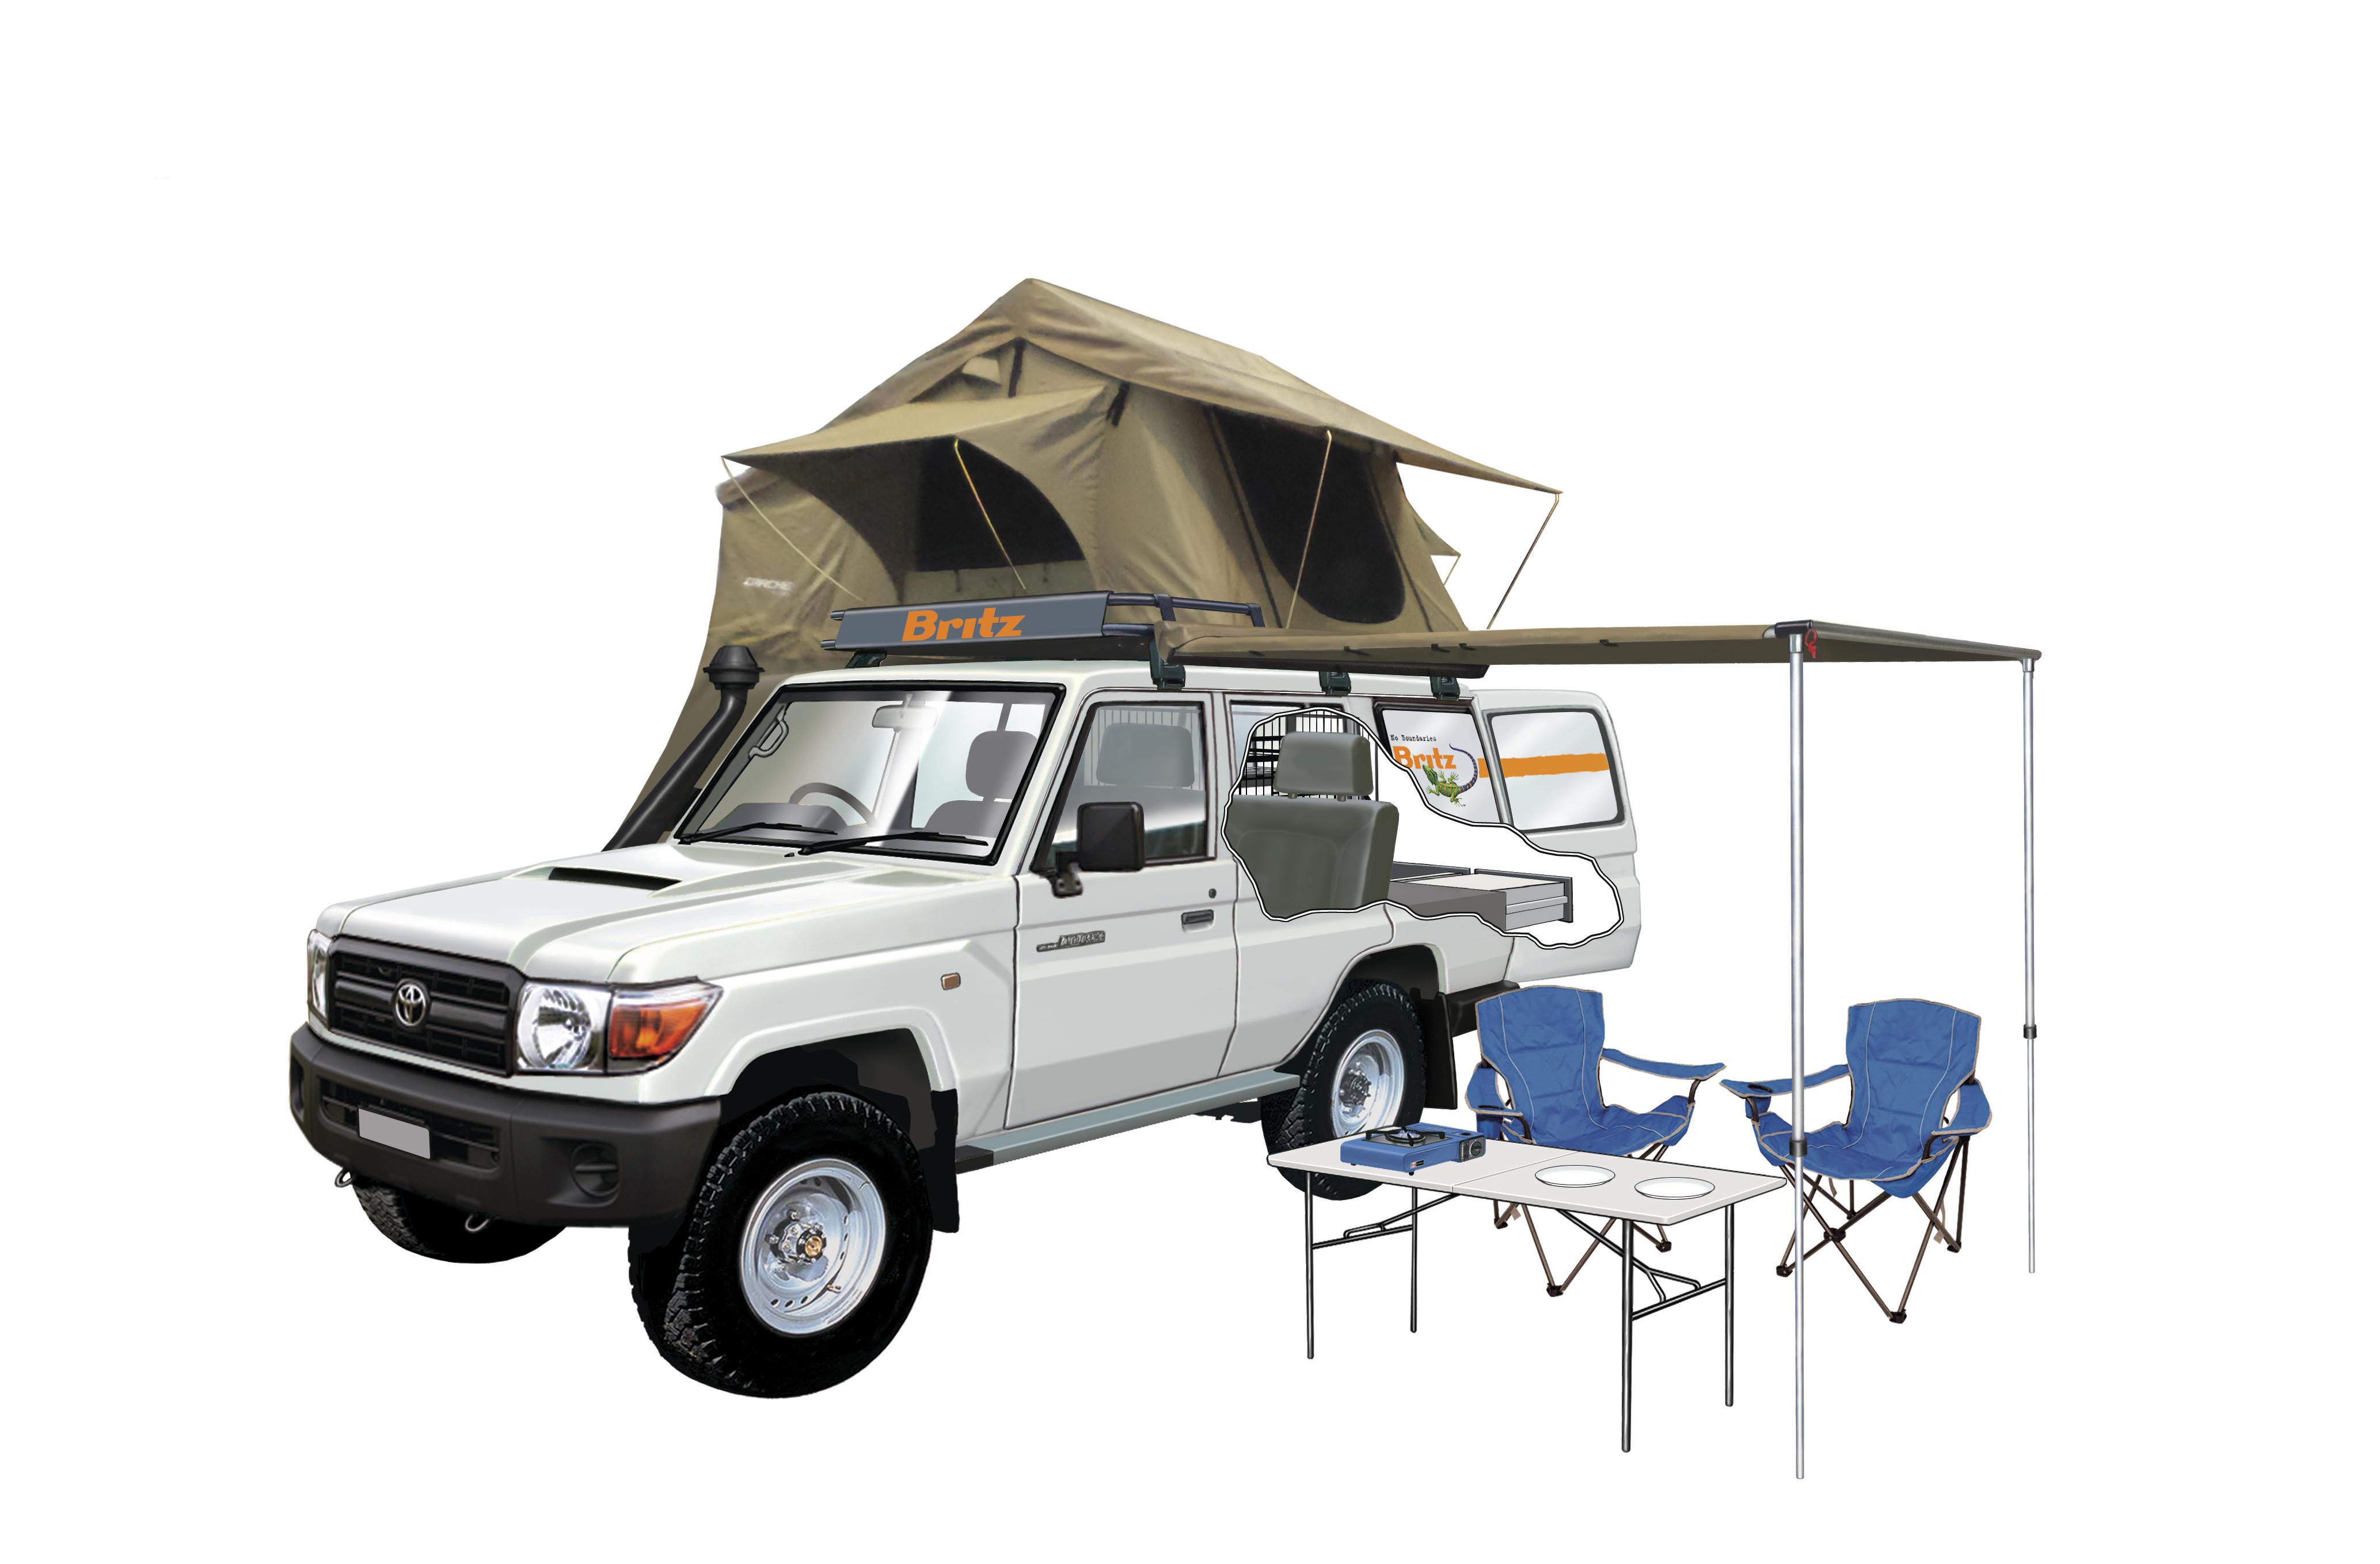 Britz Safari Landcruiser